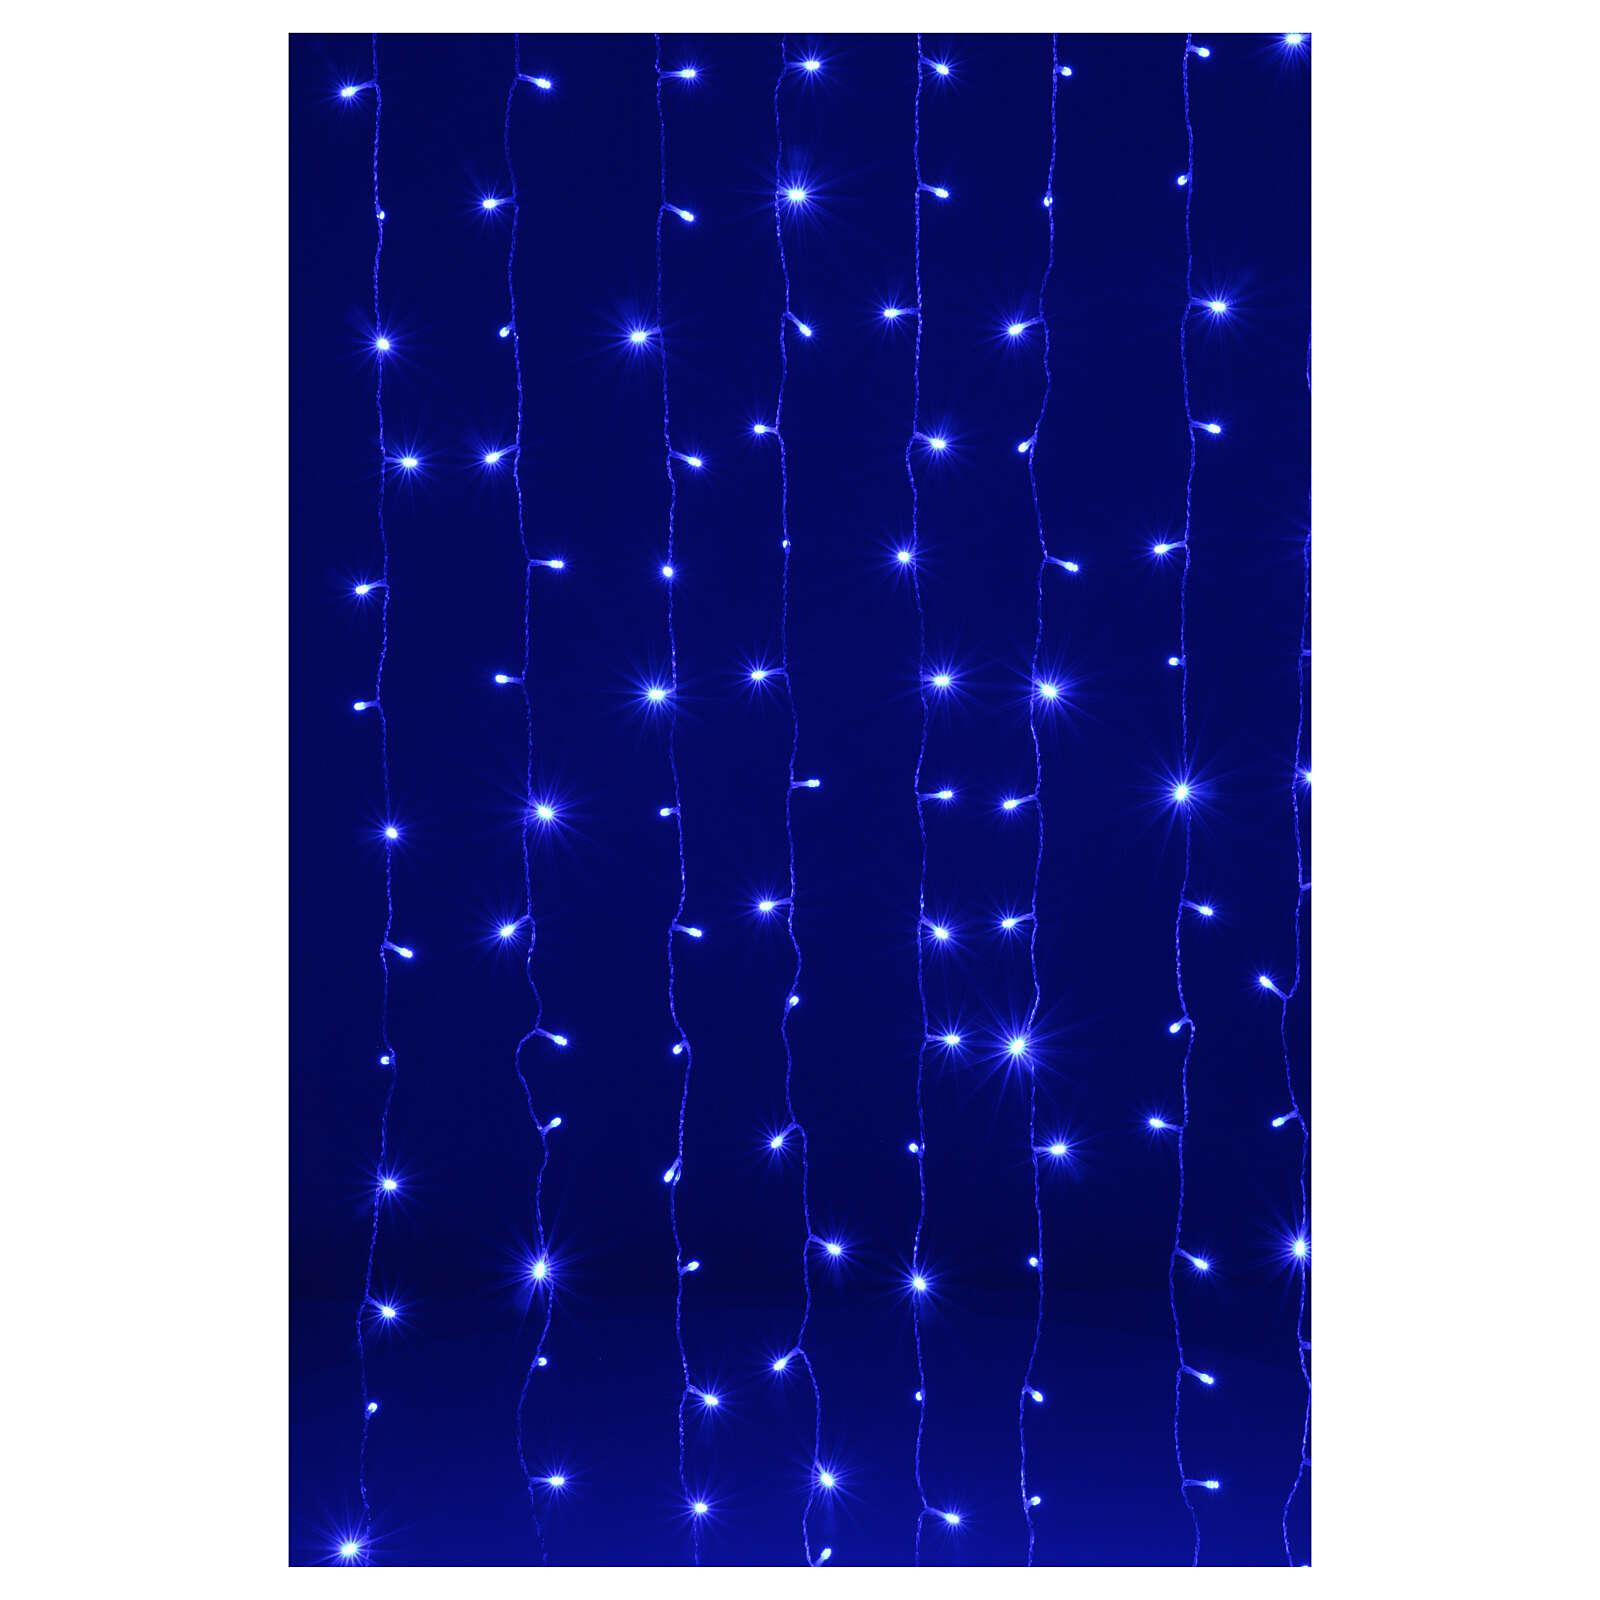 Illuminated curtain 200 leds fusion ice blue 3